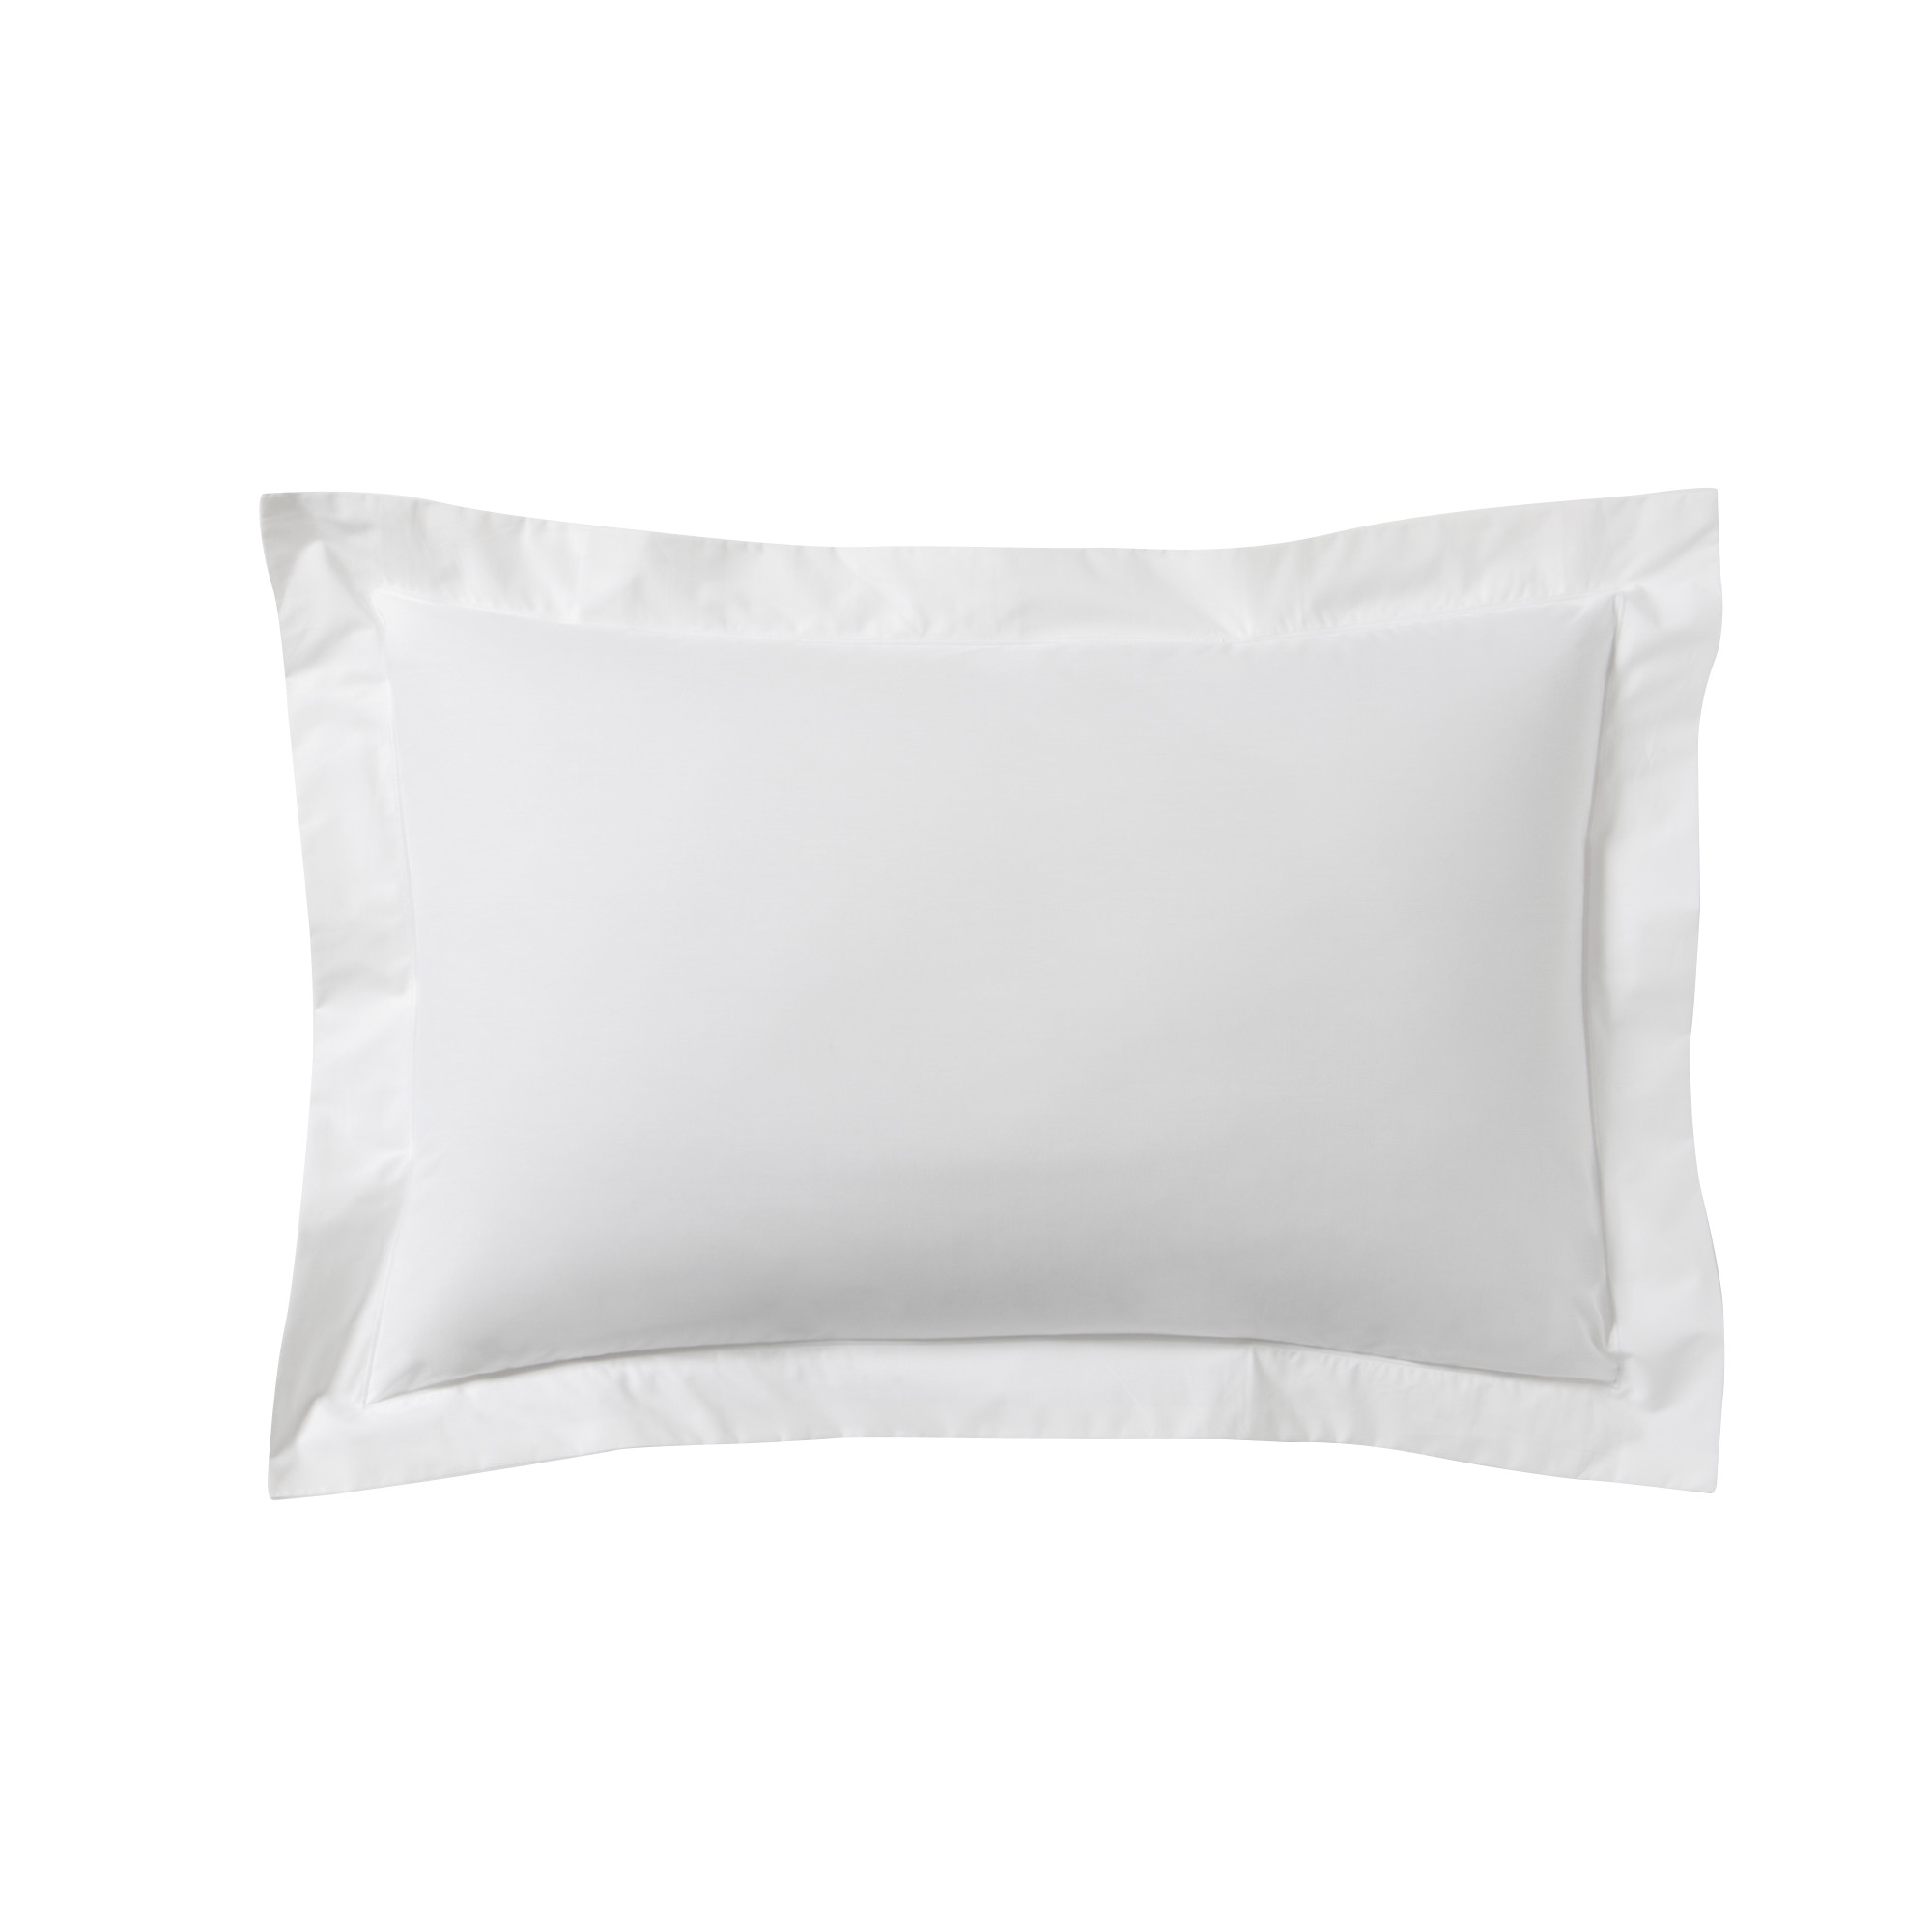 Taie d'oreiller unie en percale de coton blanc 50x70